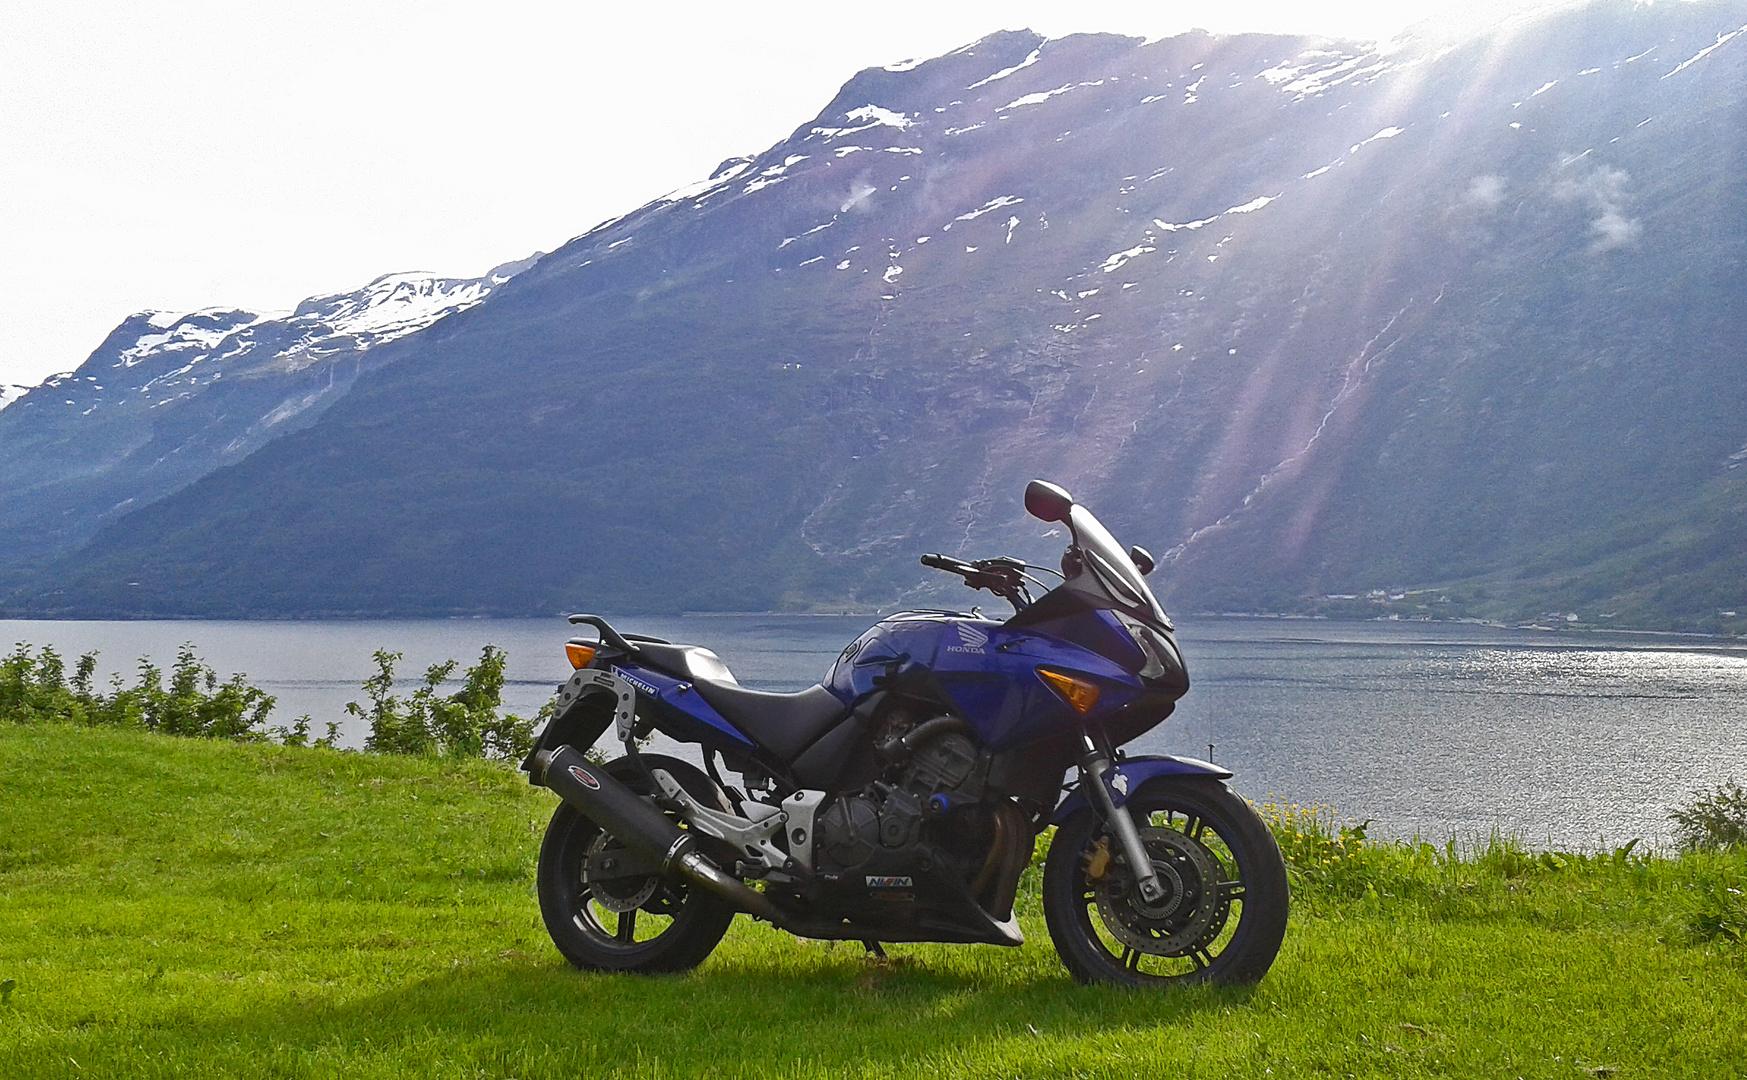 5800 Kilometer ohne Probleme